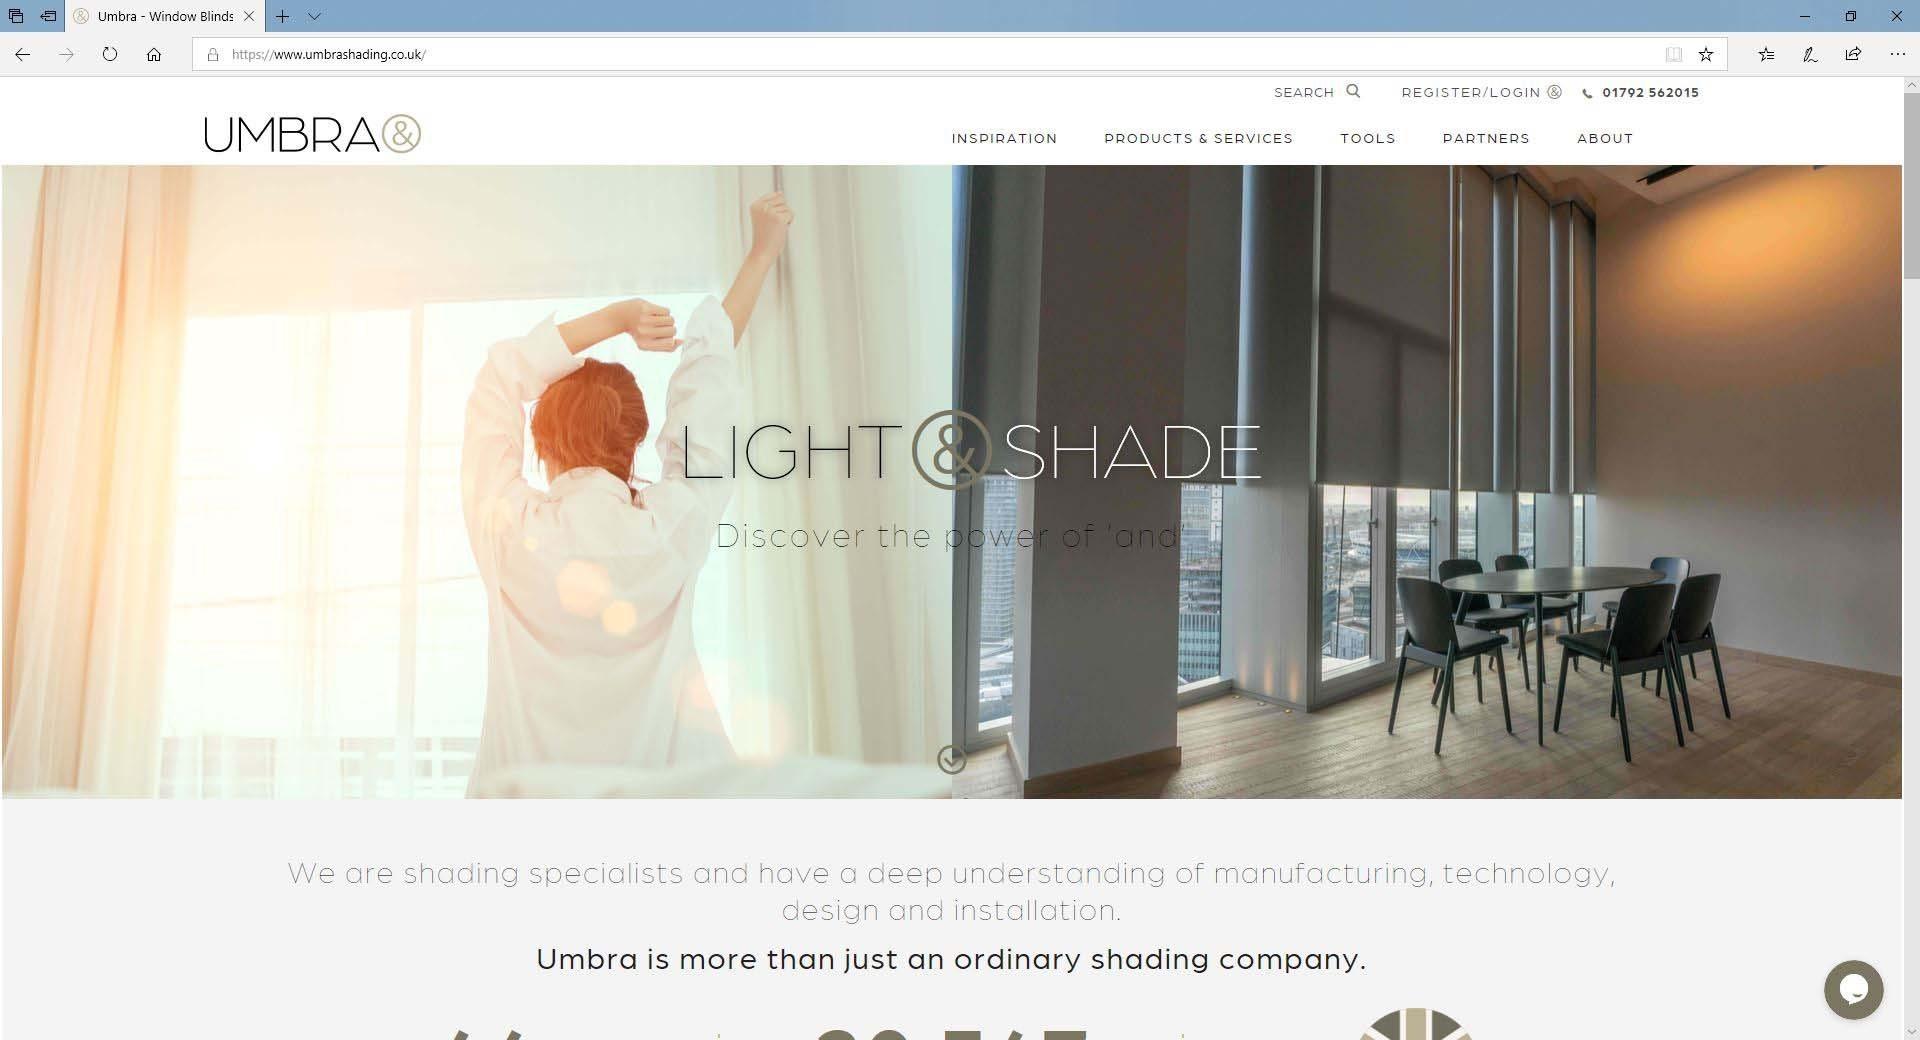 umbra website main page